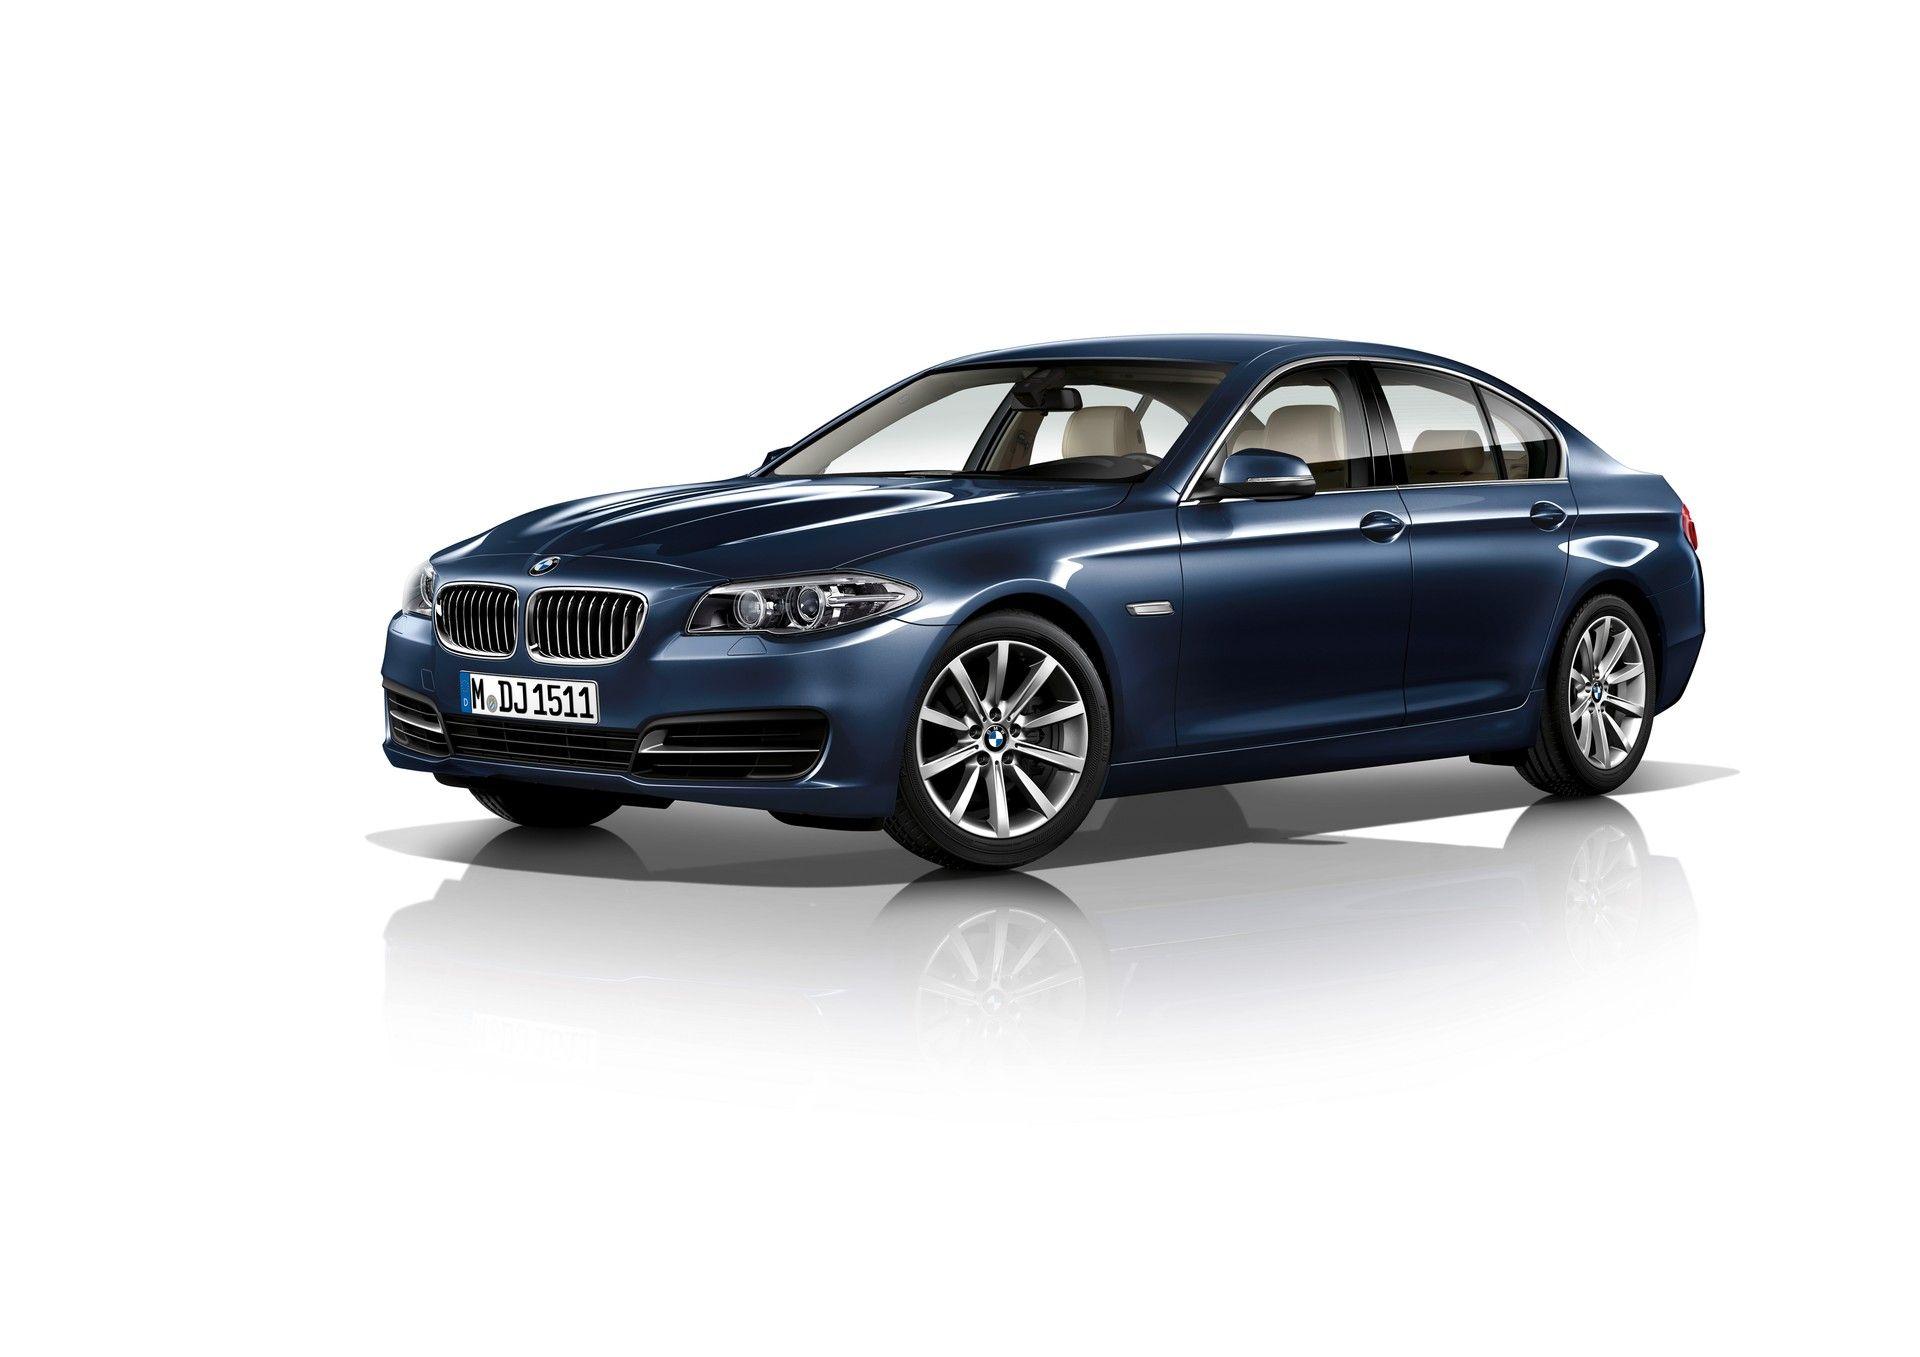 Bmw 5 Series 2015 Google Search Best Car Deals Bmw Bmw New Cars